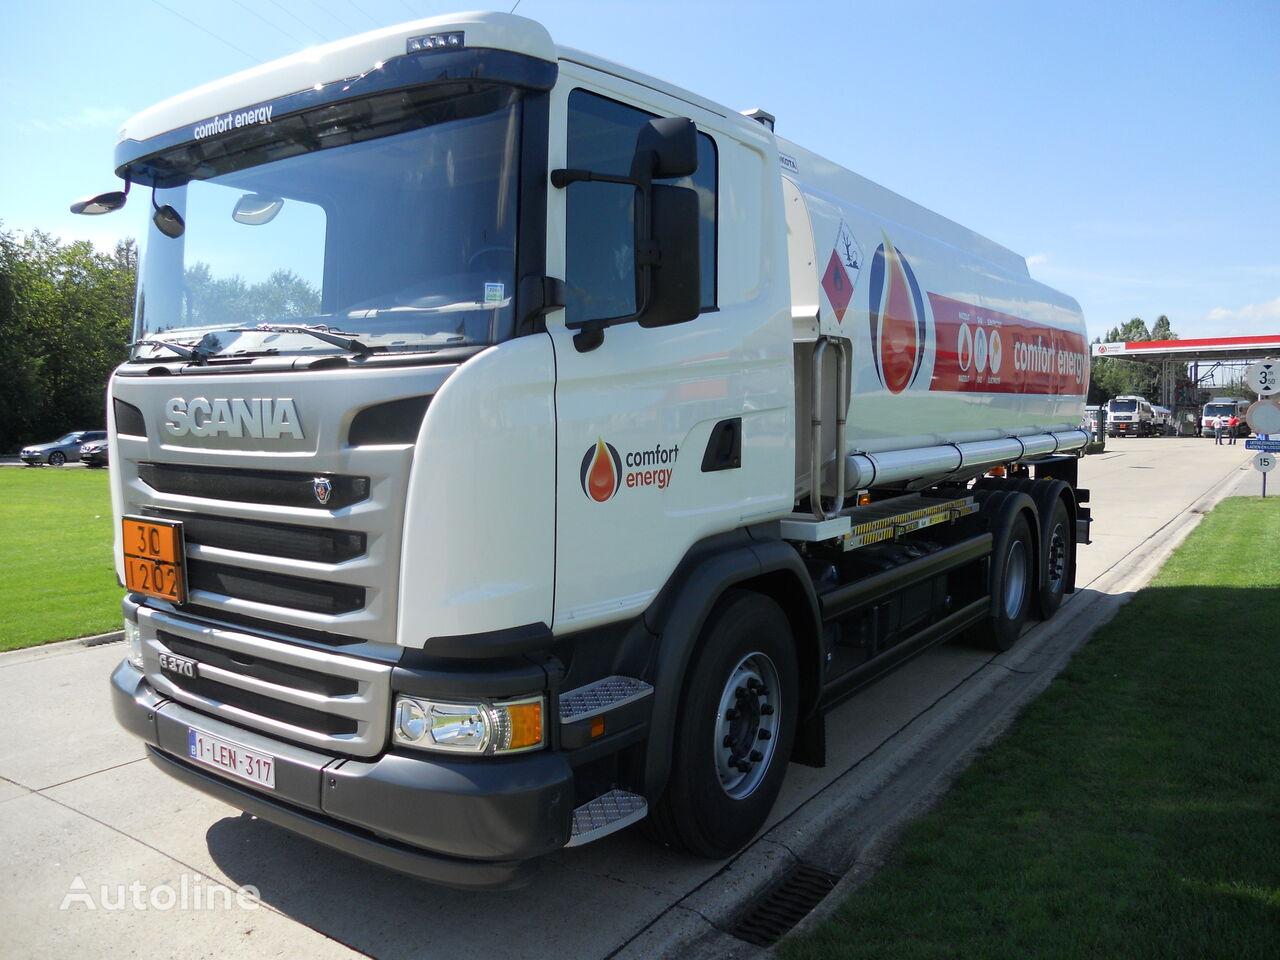 SCANIA camion cisternă combustibil